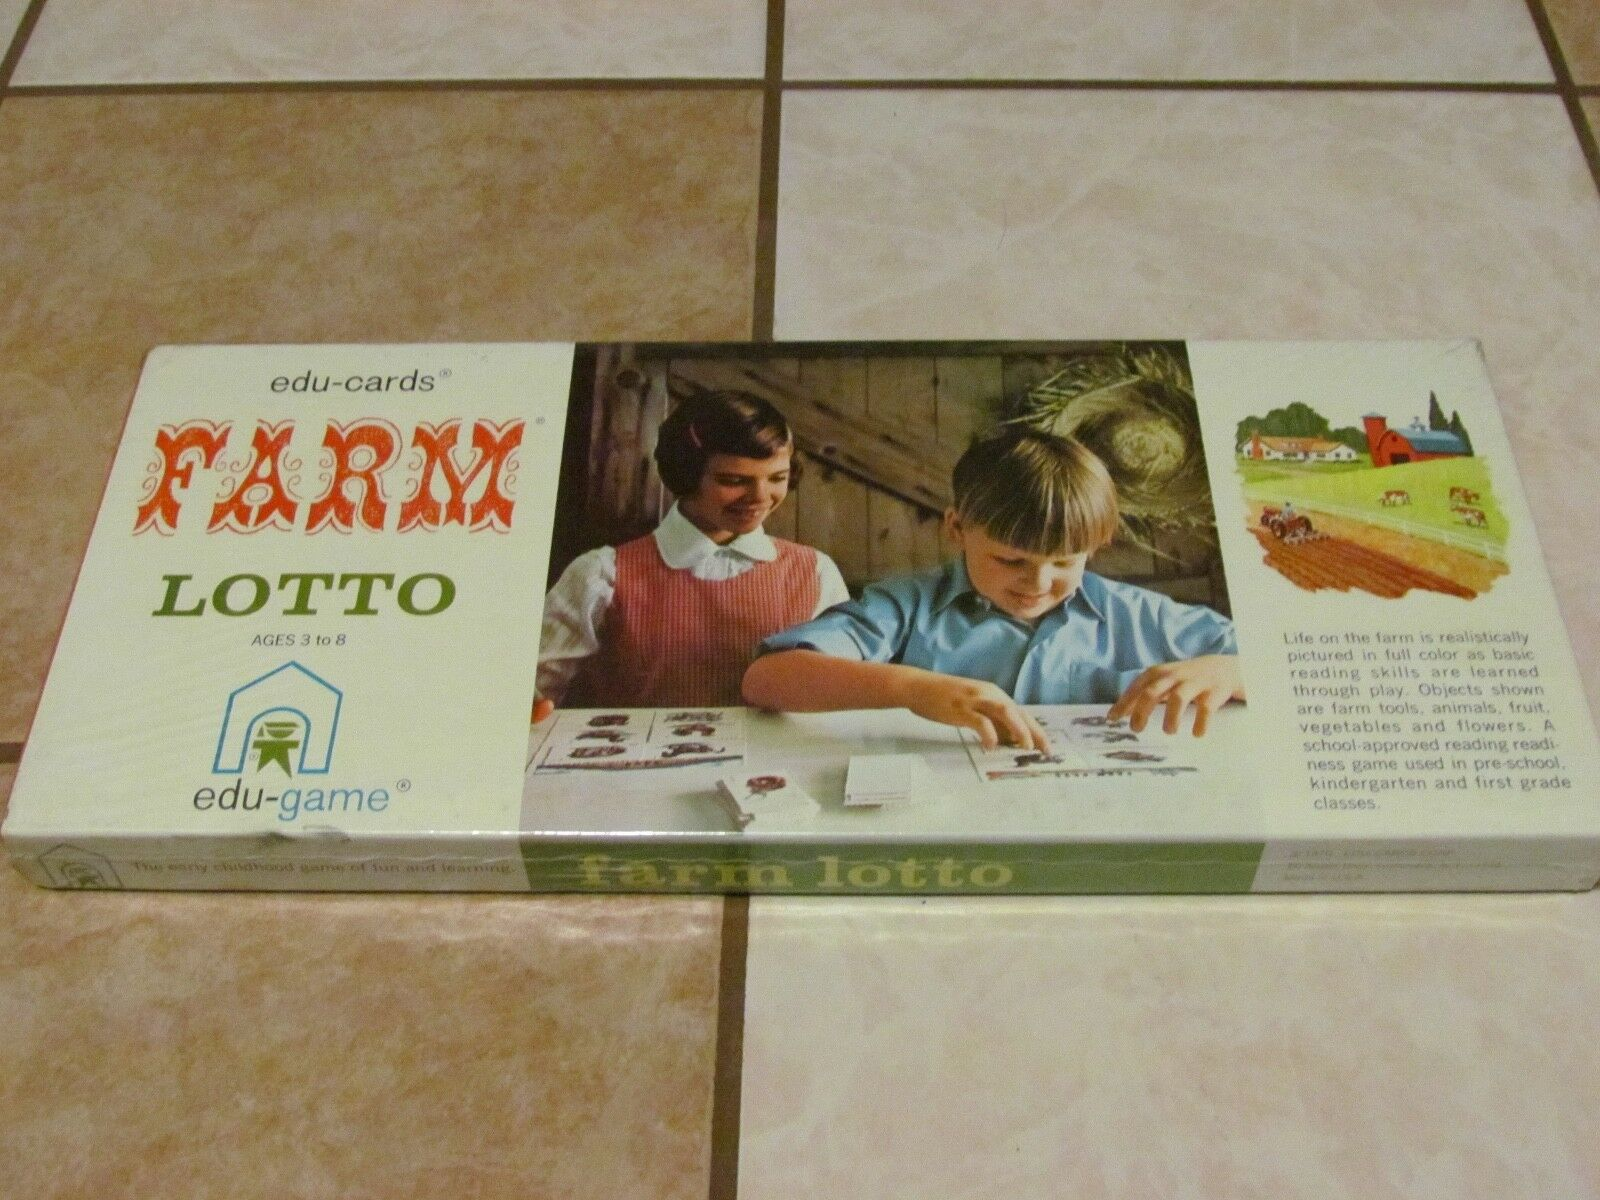 NEW SEALED EDU-CARDS FARM LOTTO 1970 EDU-GAME RARE VINTAGE FUN LEARNING